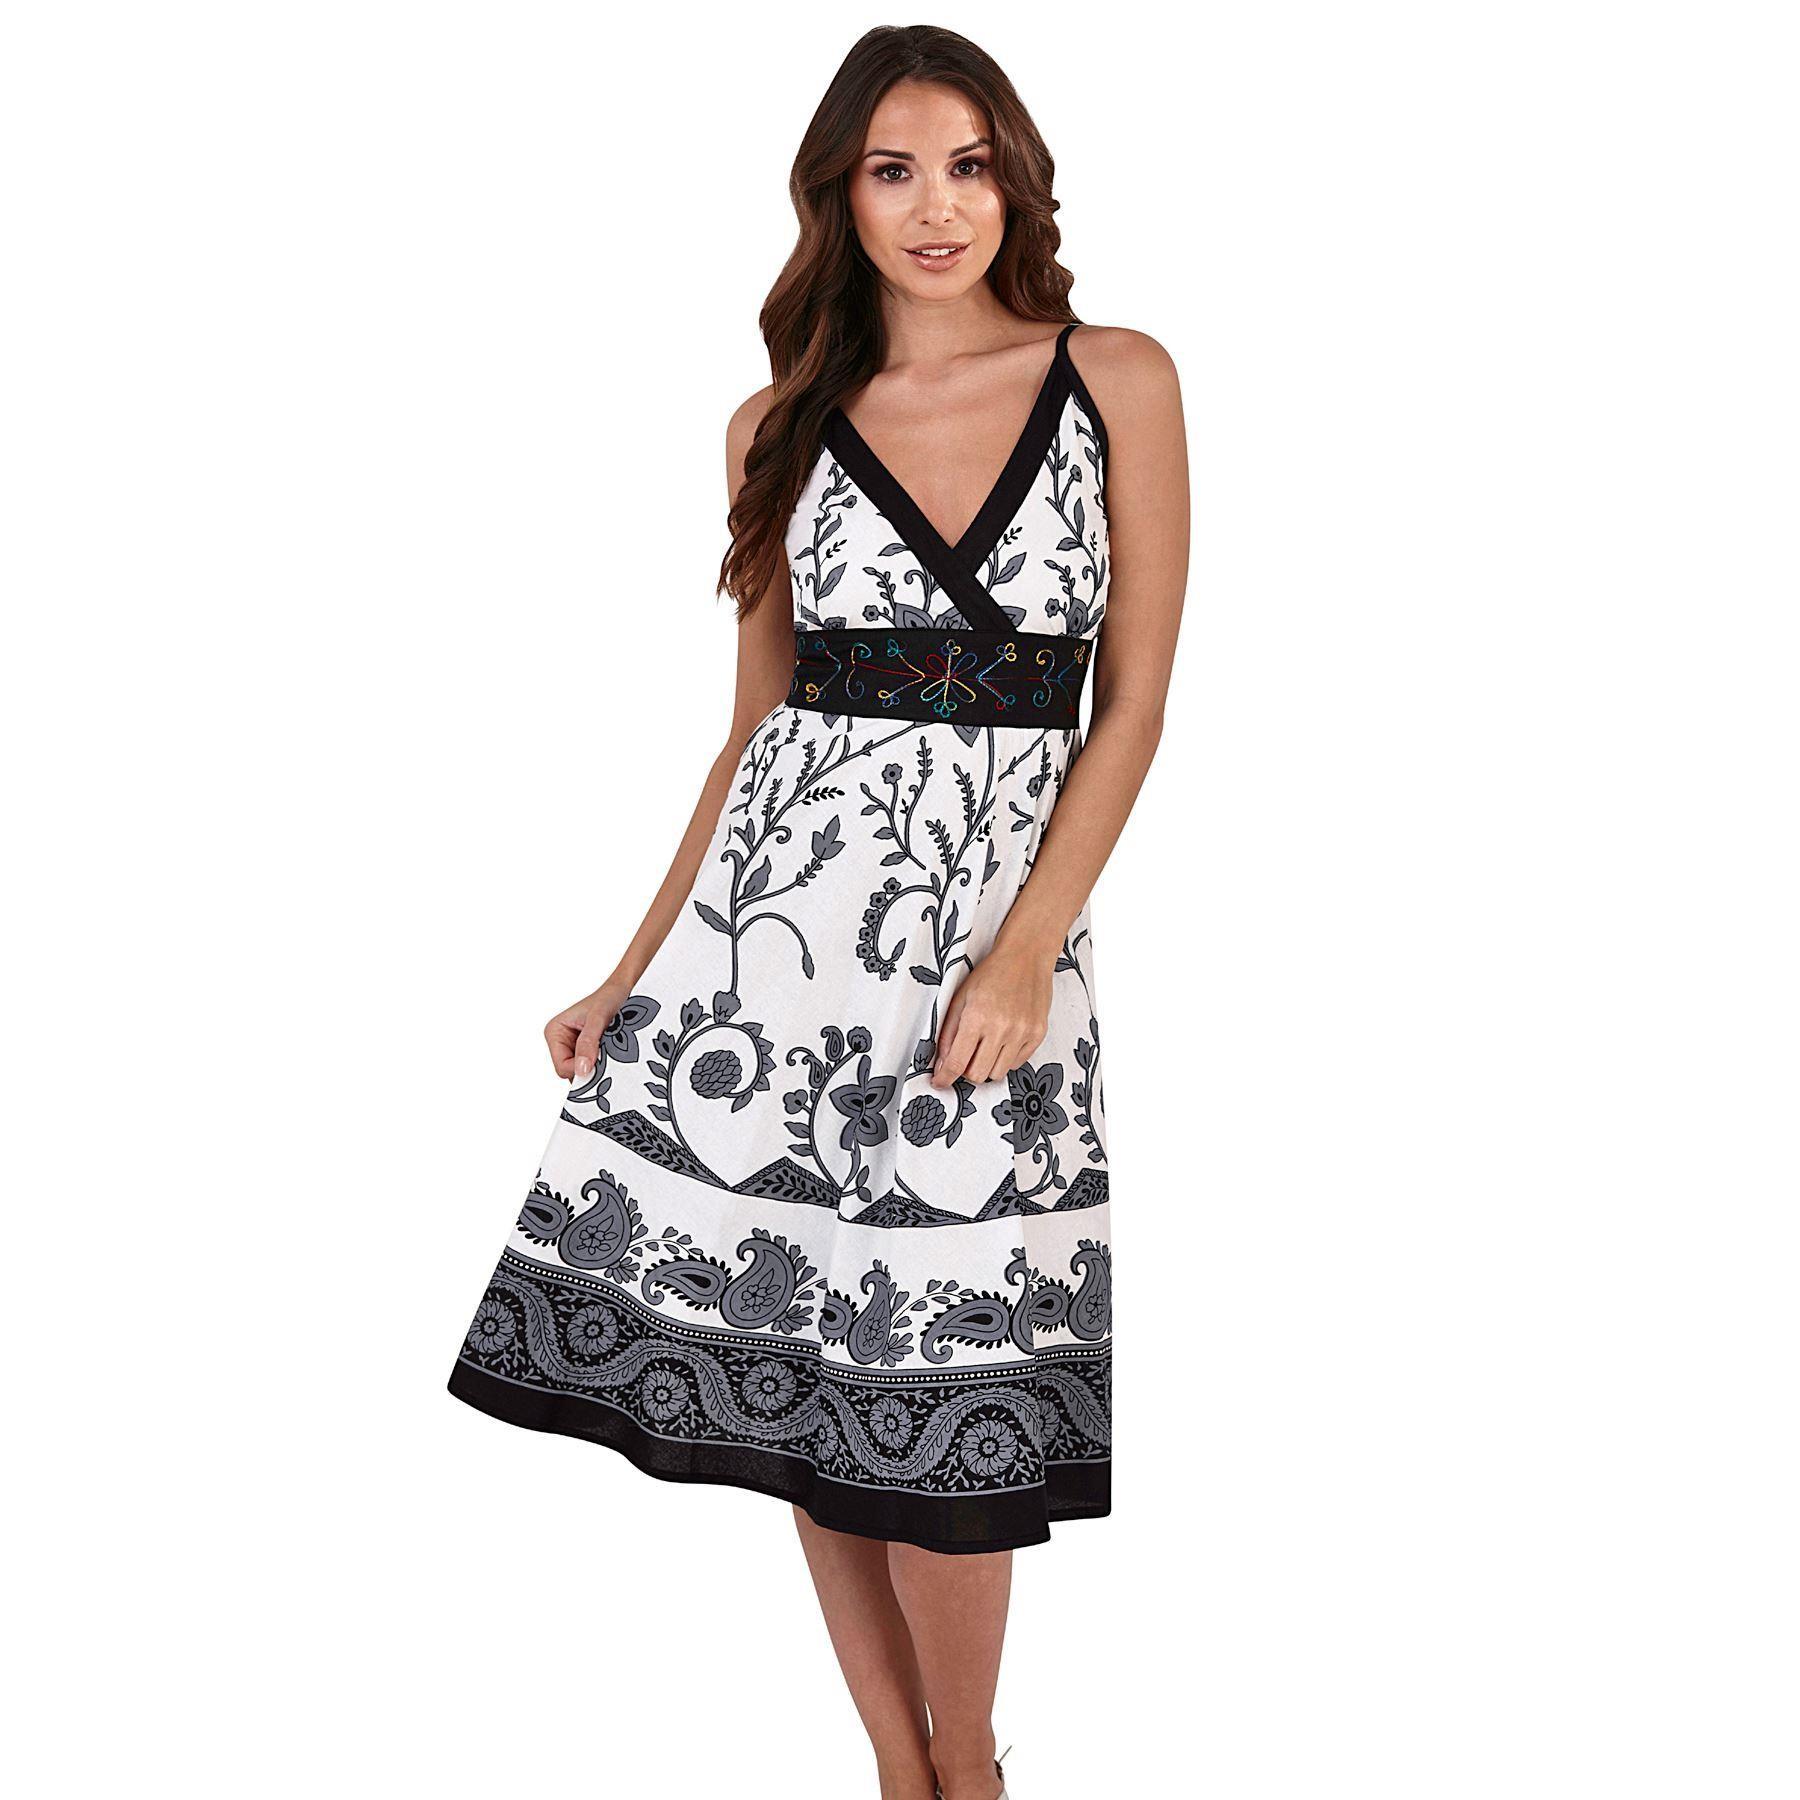 Pistachio Patterned Crossover Dress - Black